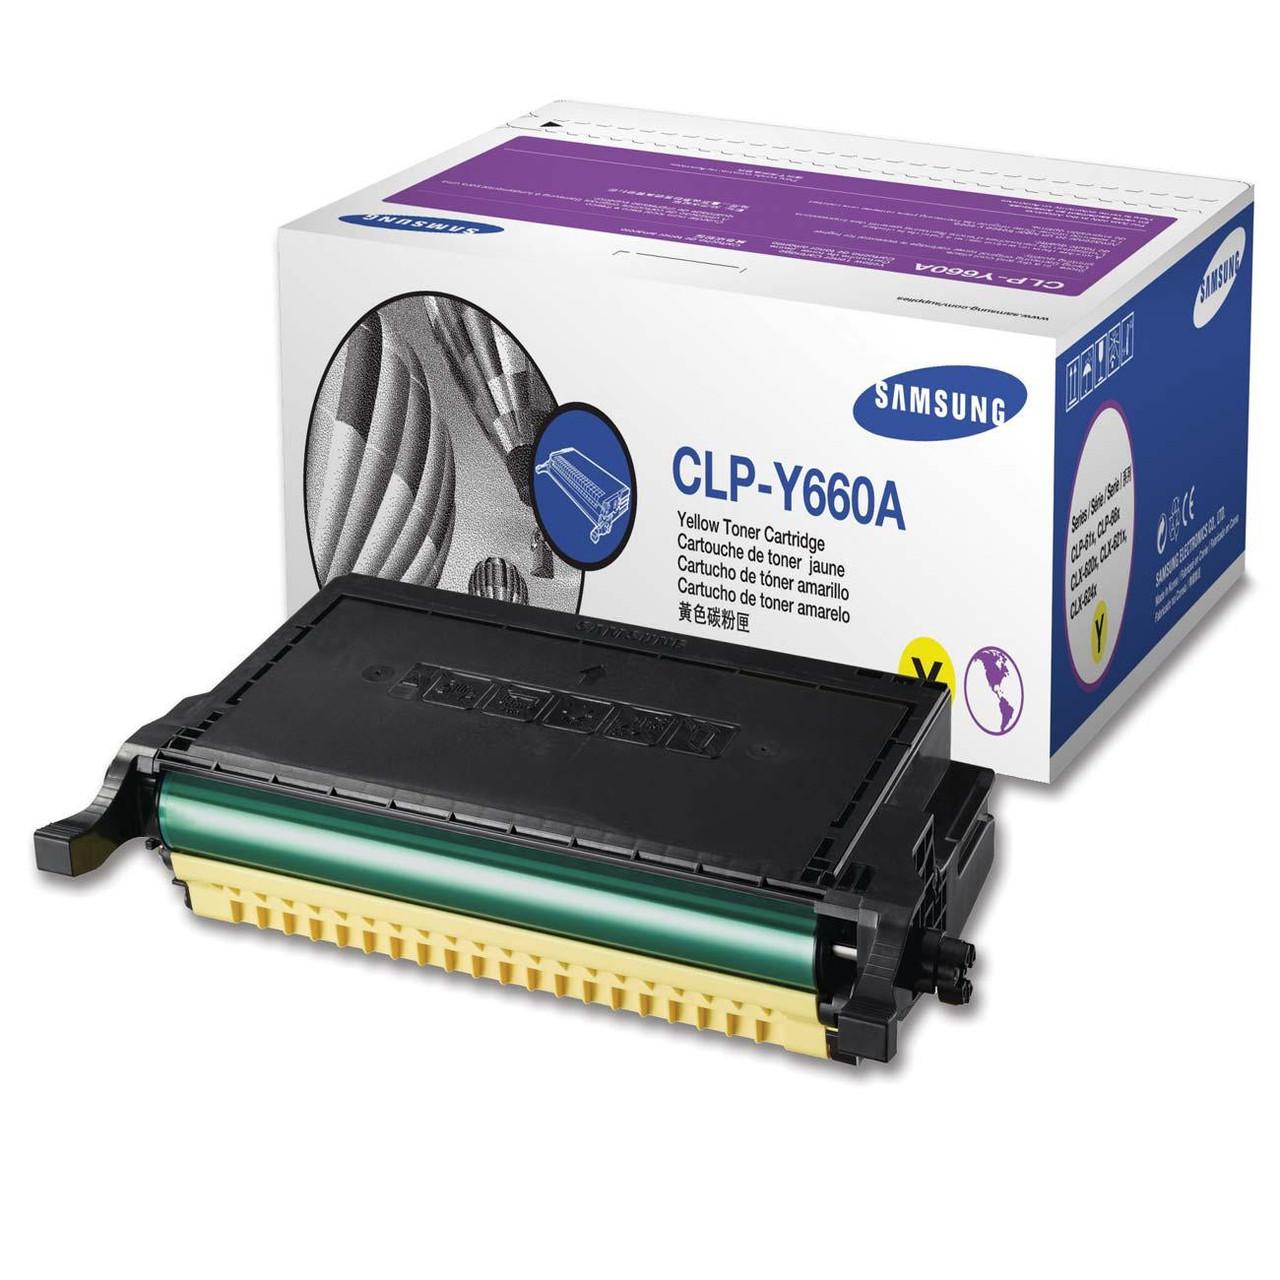 Заправка картриджа CLP-Y660A принтера Samsung CLP-610ND/ 660N YELLOW